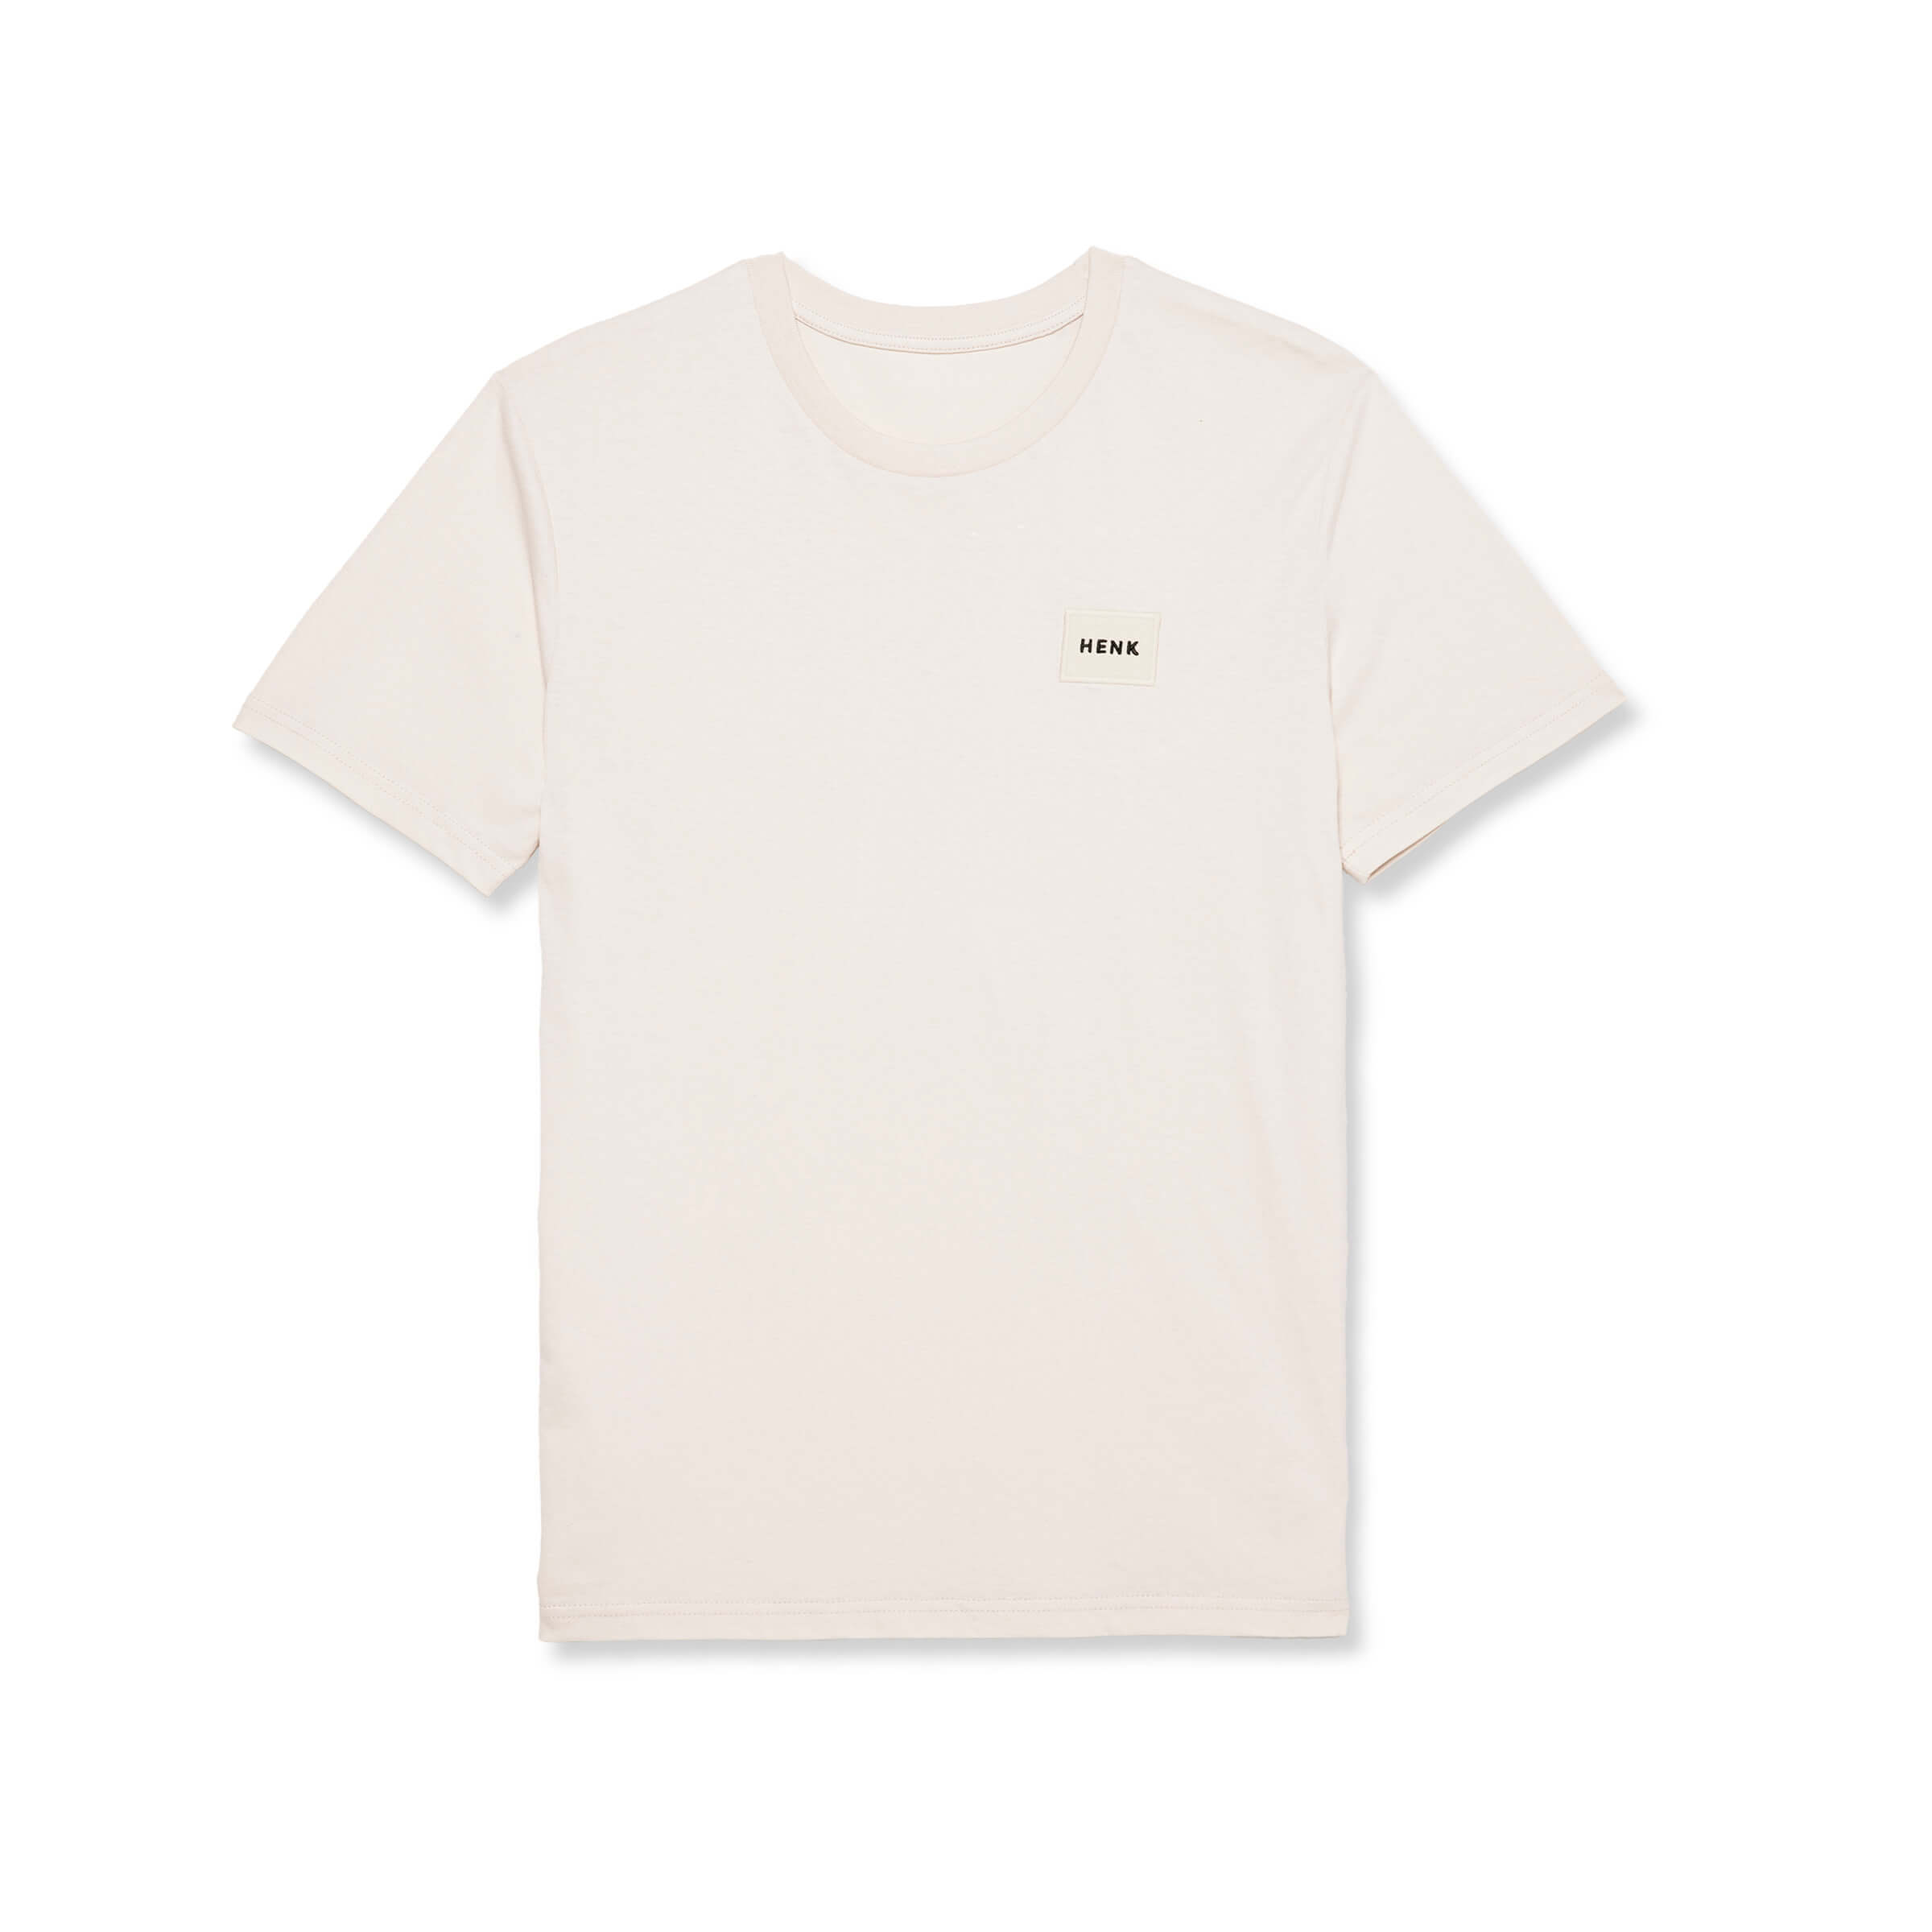 T-shirt | Cream | Studio HENK | Listing_image